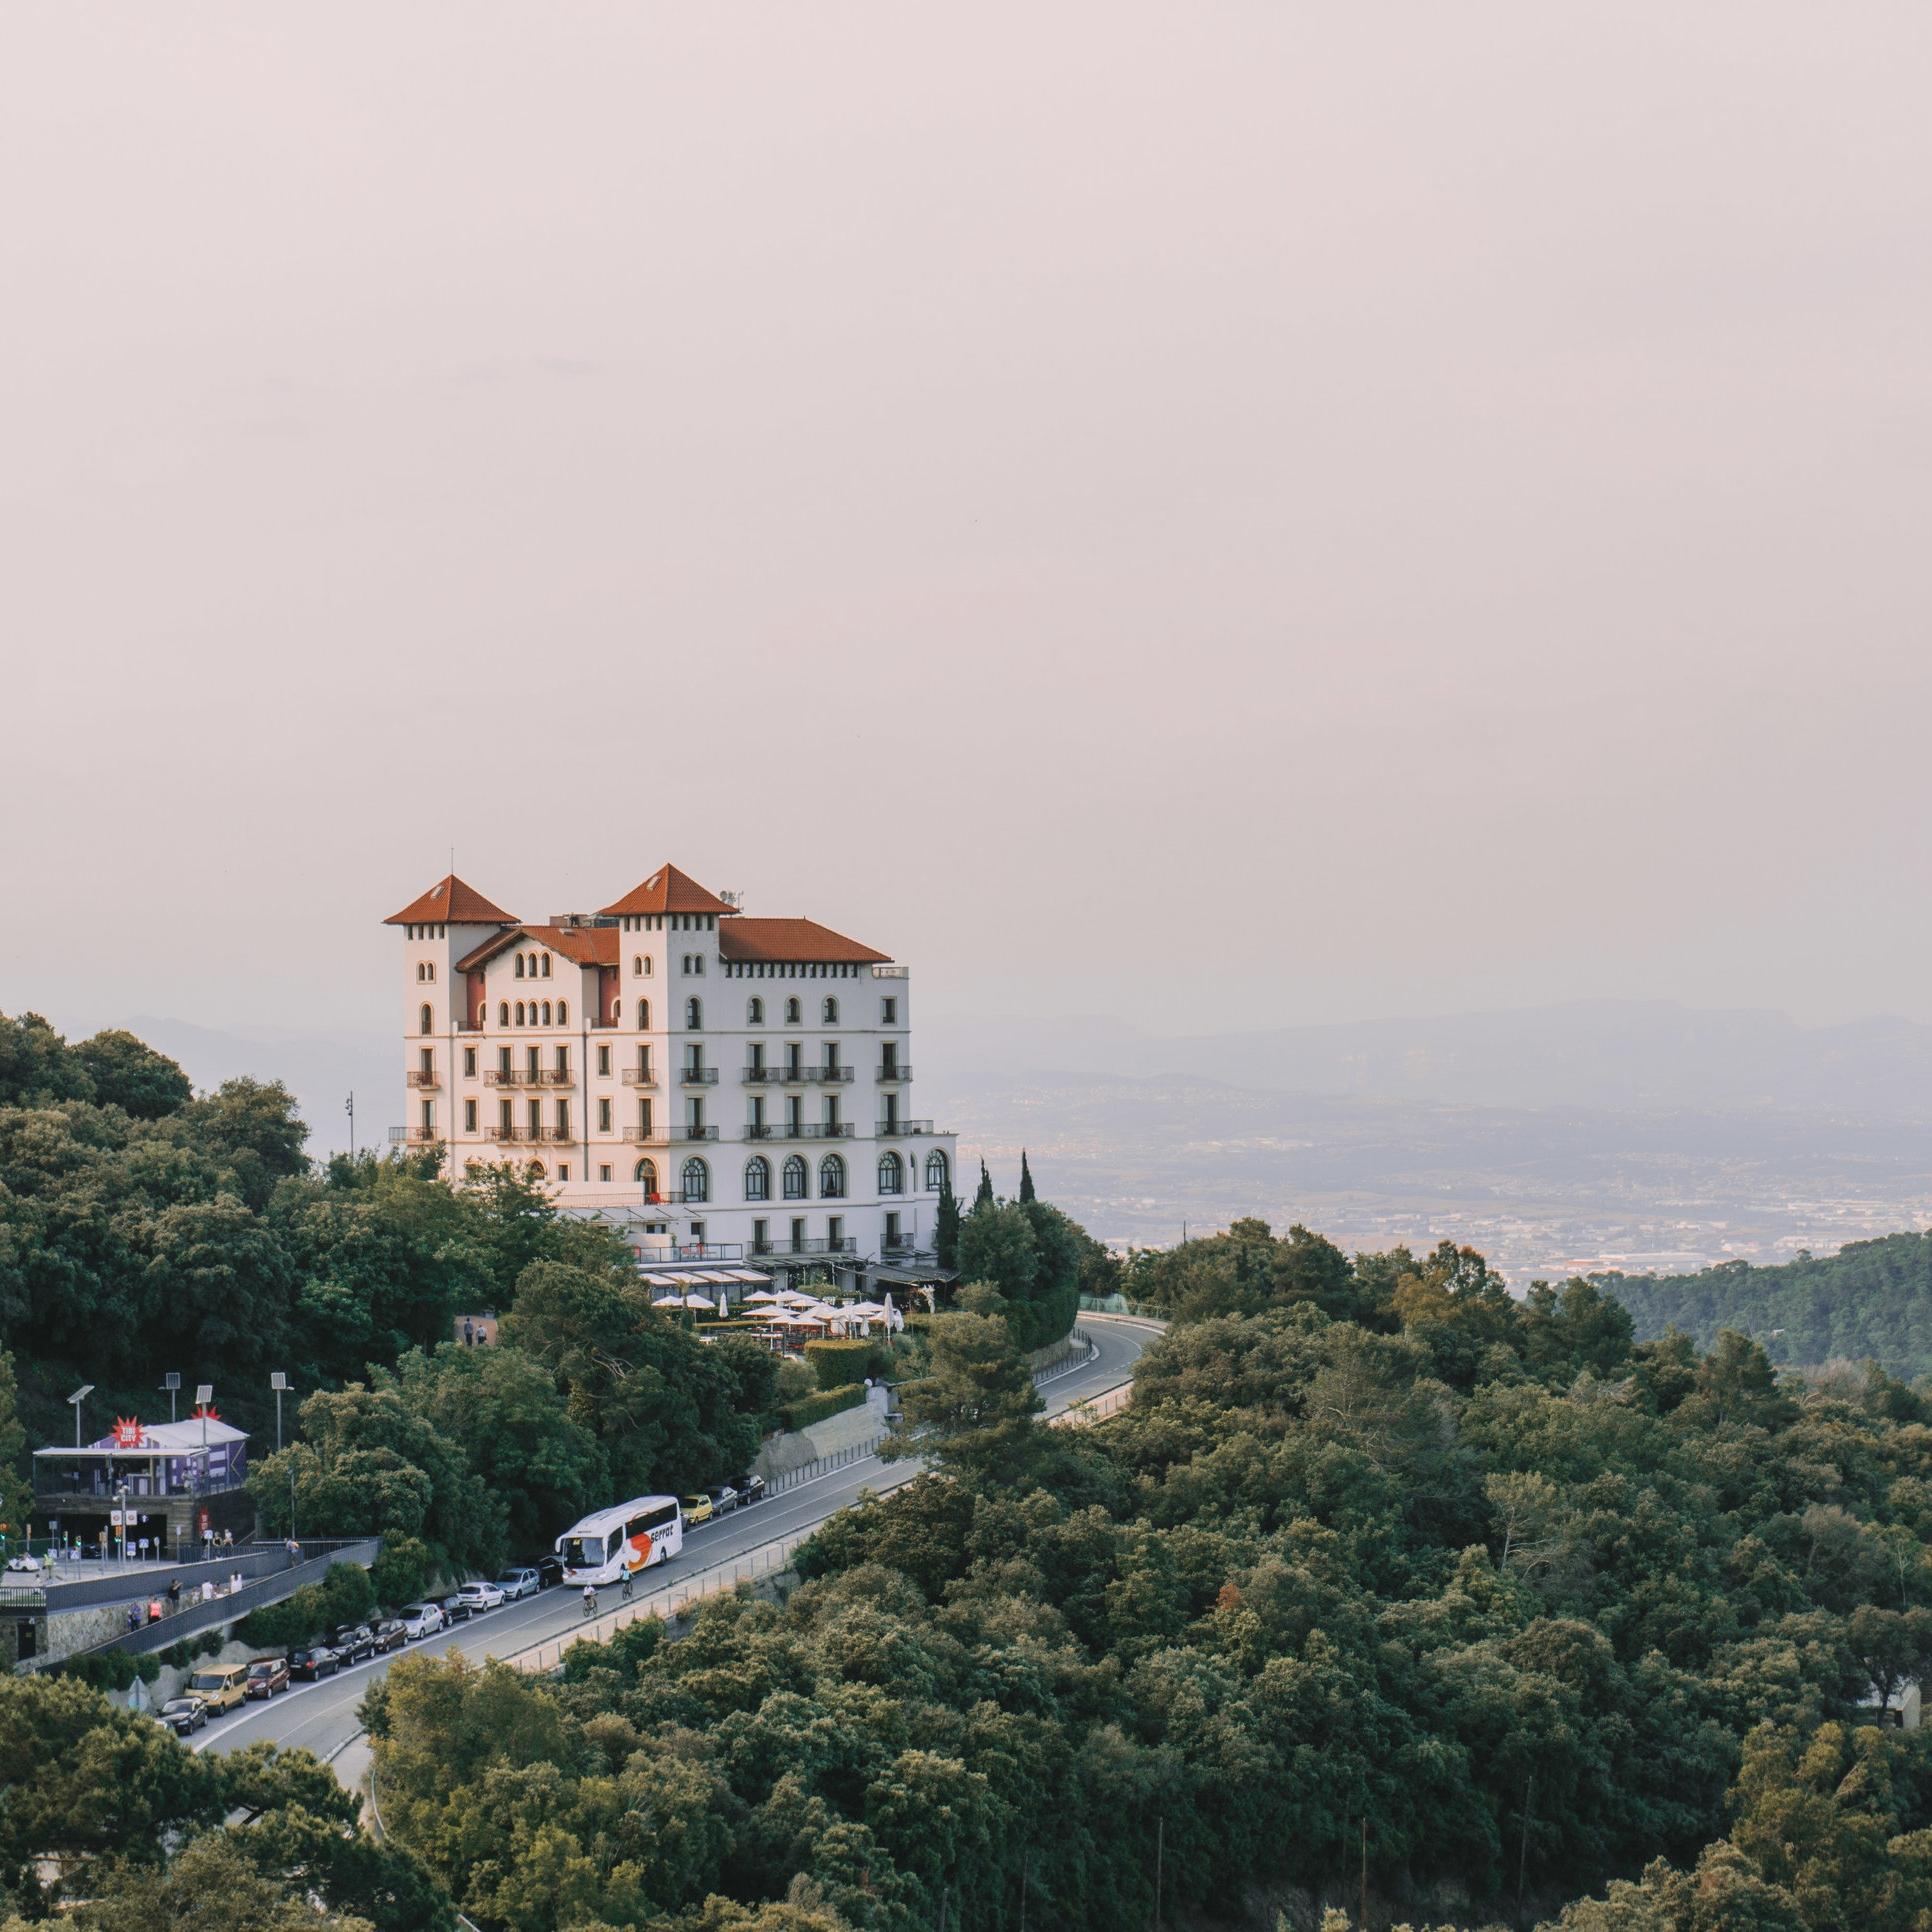 Gran Hotel La Florida in Barcelona, Spain